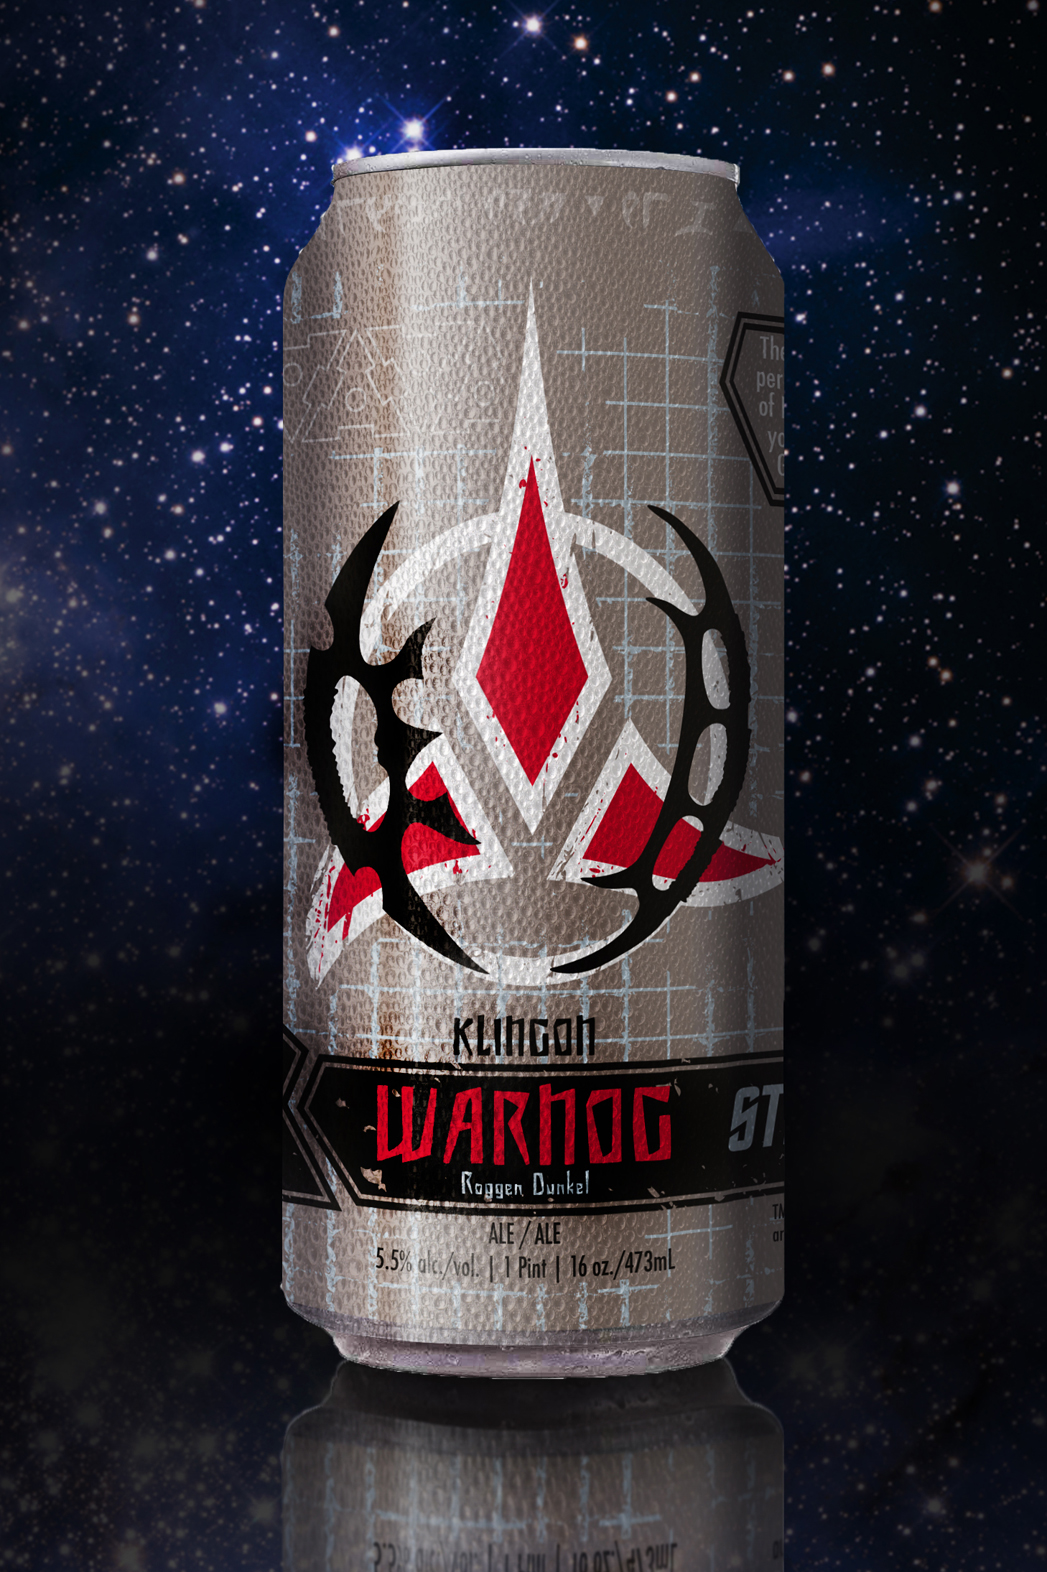 Klingon Warnog - P 2014